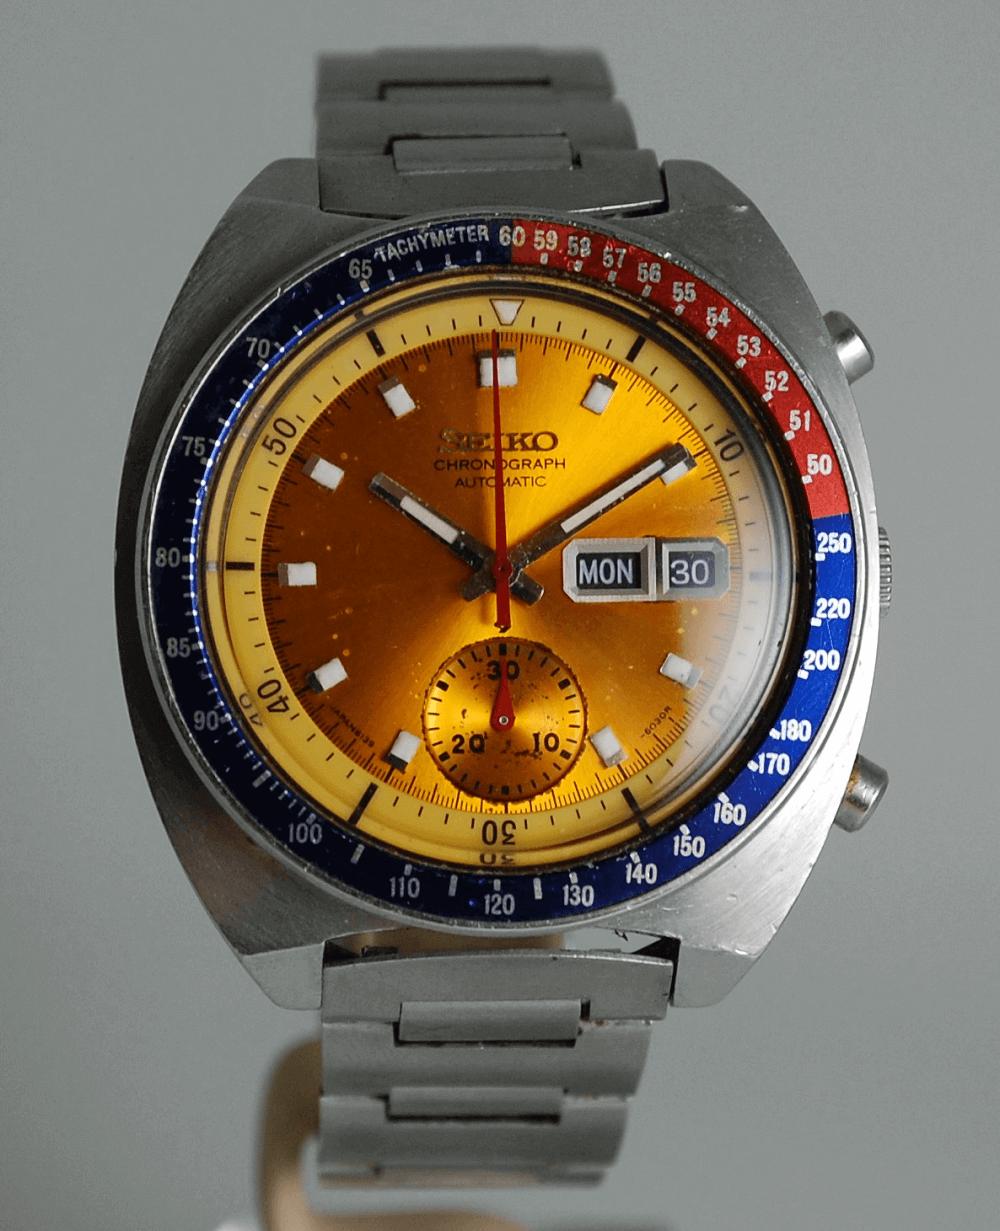 Đồng hồ Seiko 6139